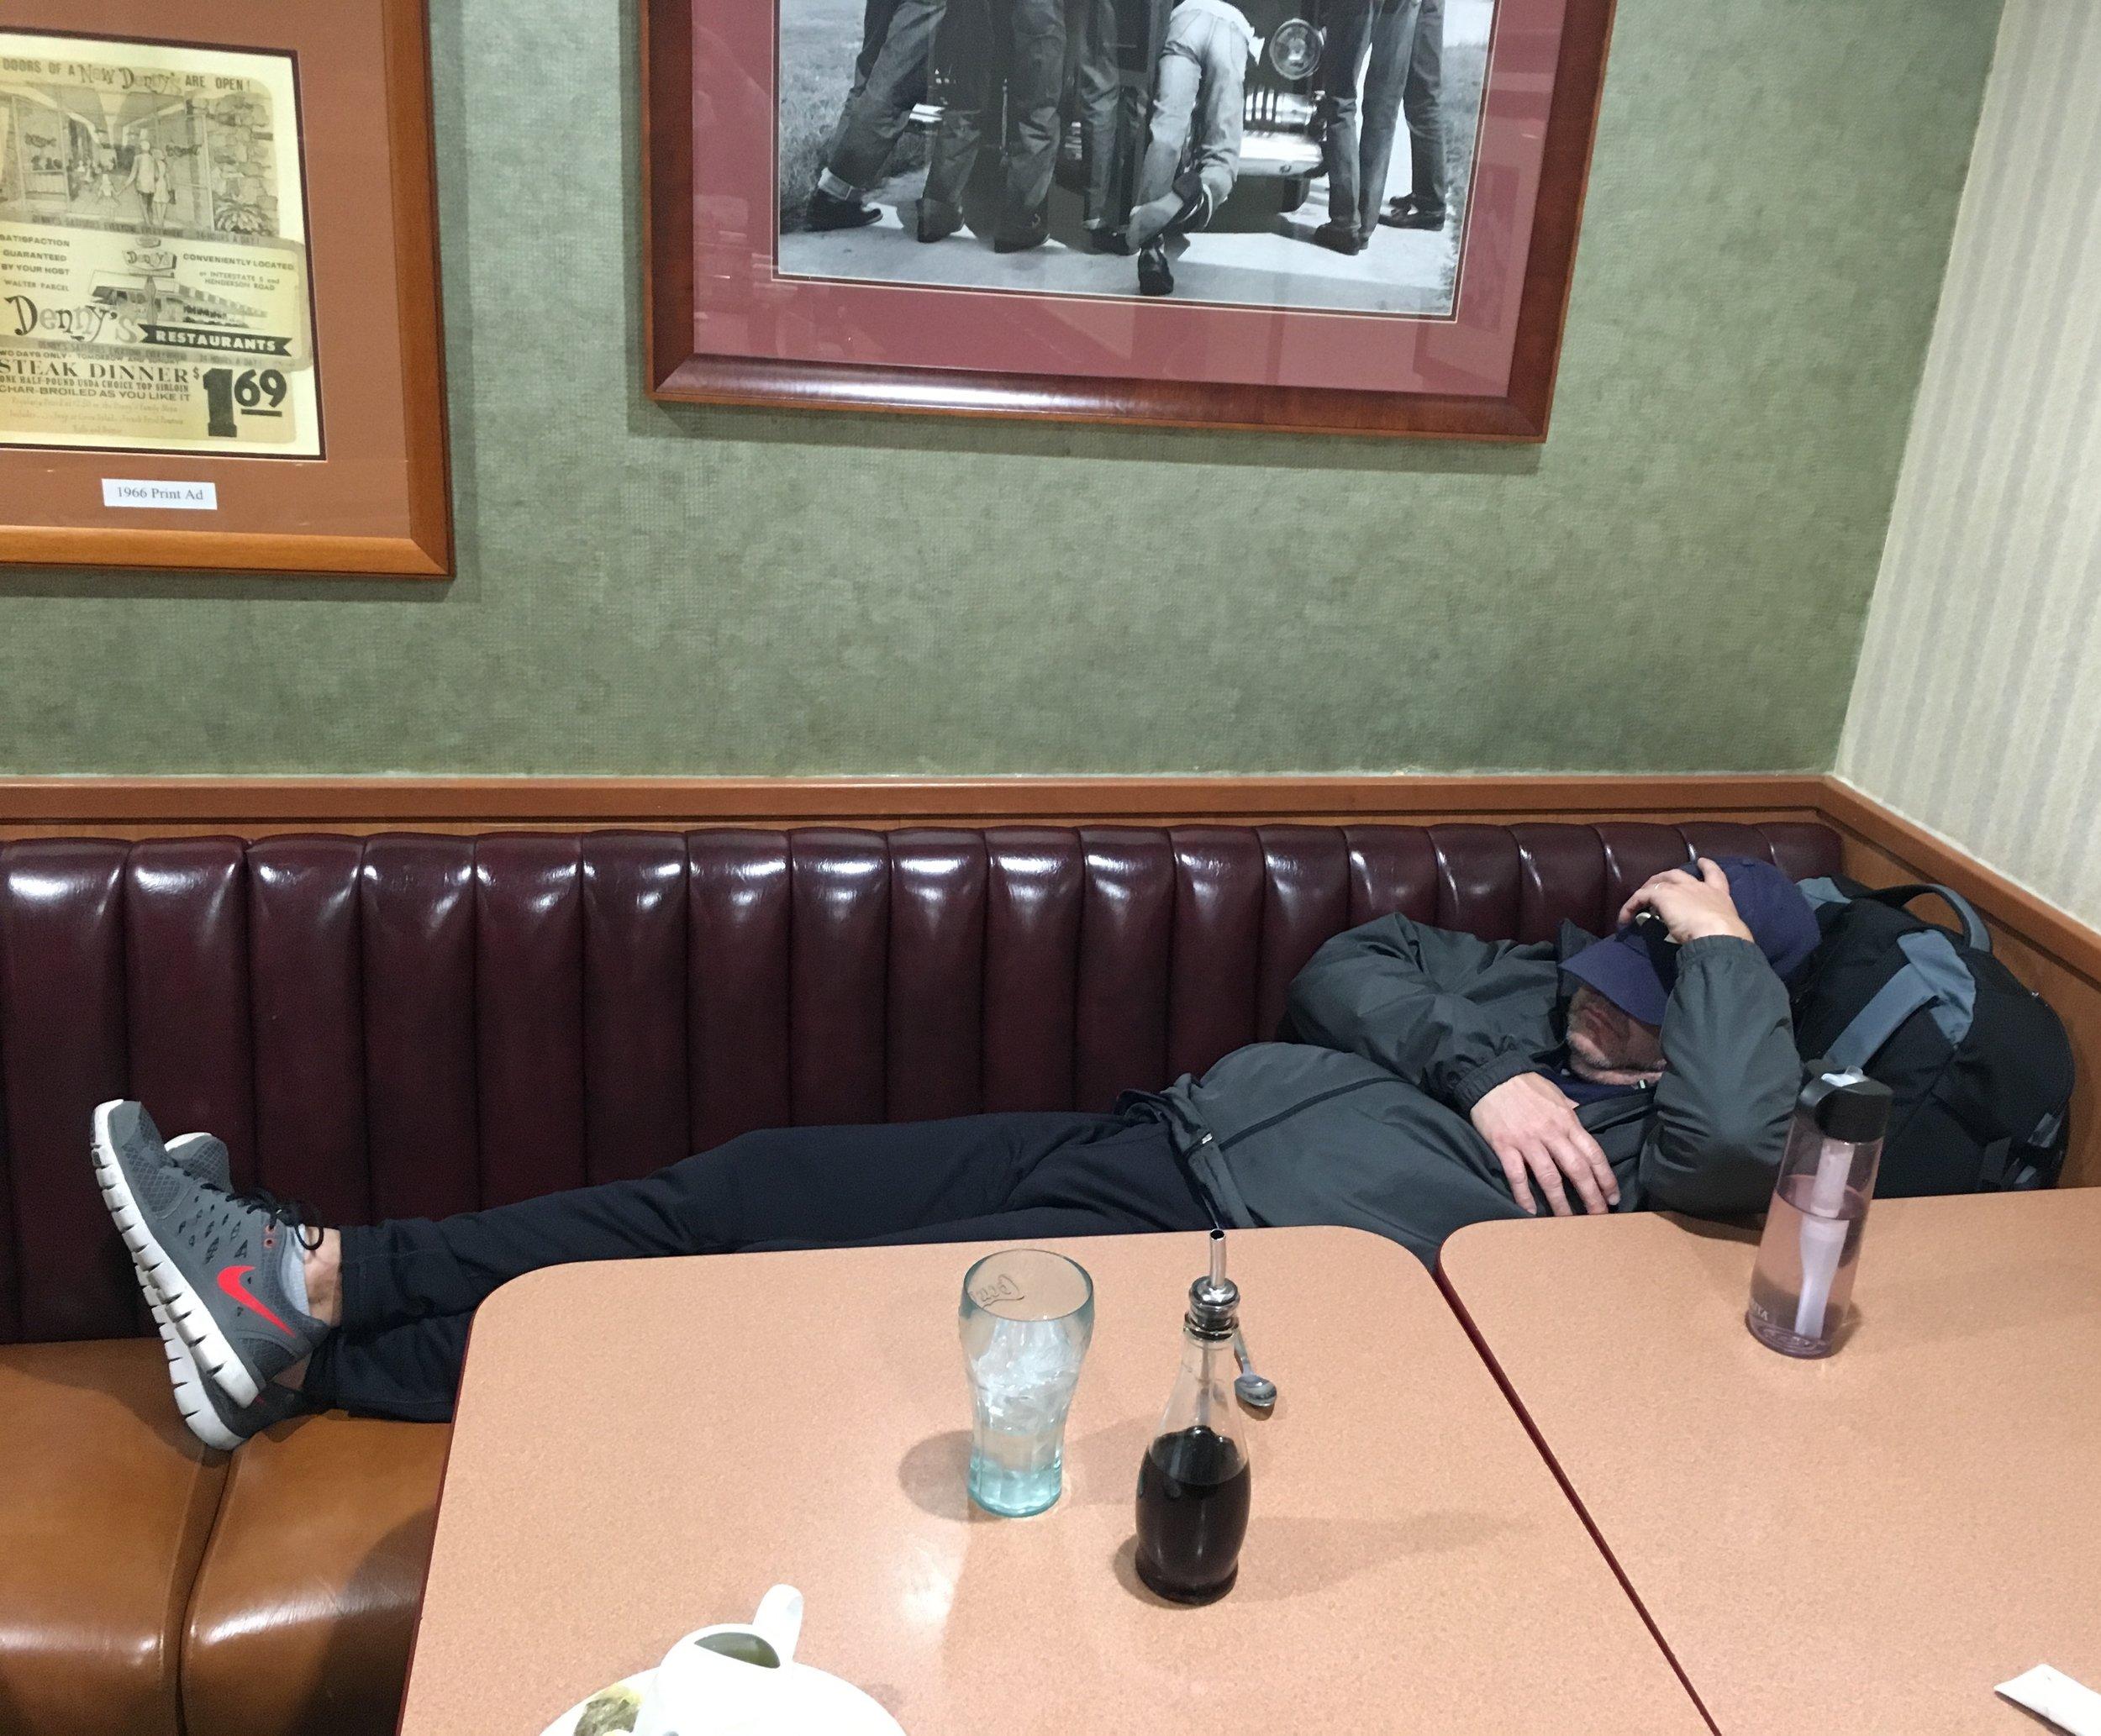 steve sleeping at Dennys.JPG